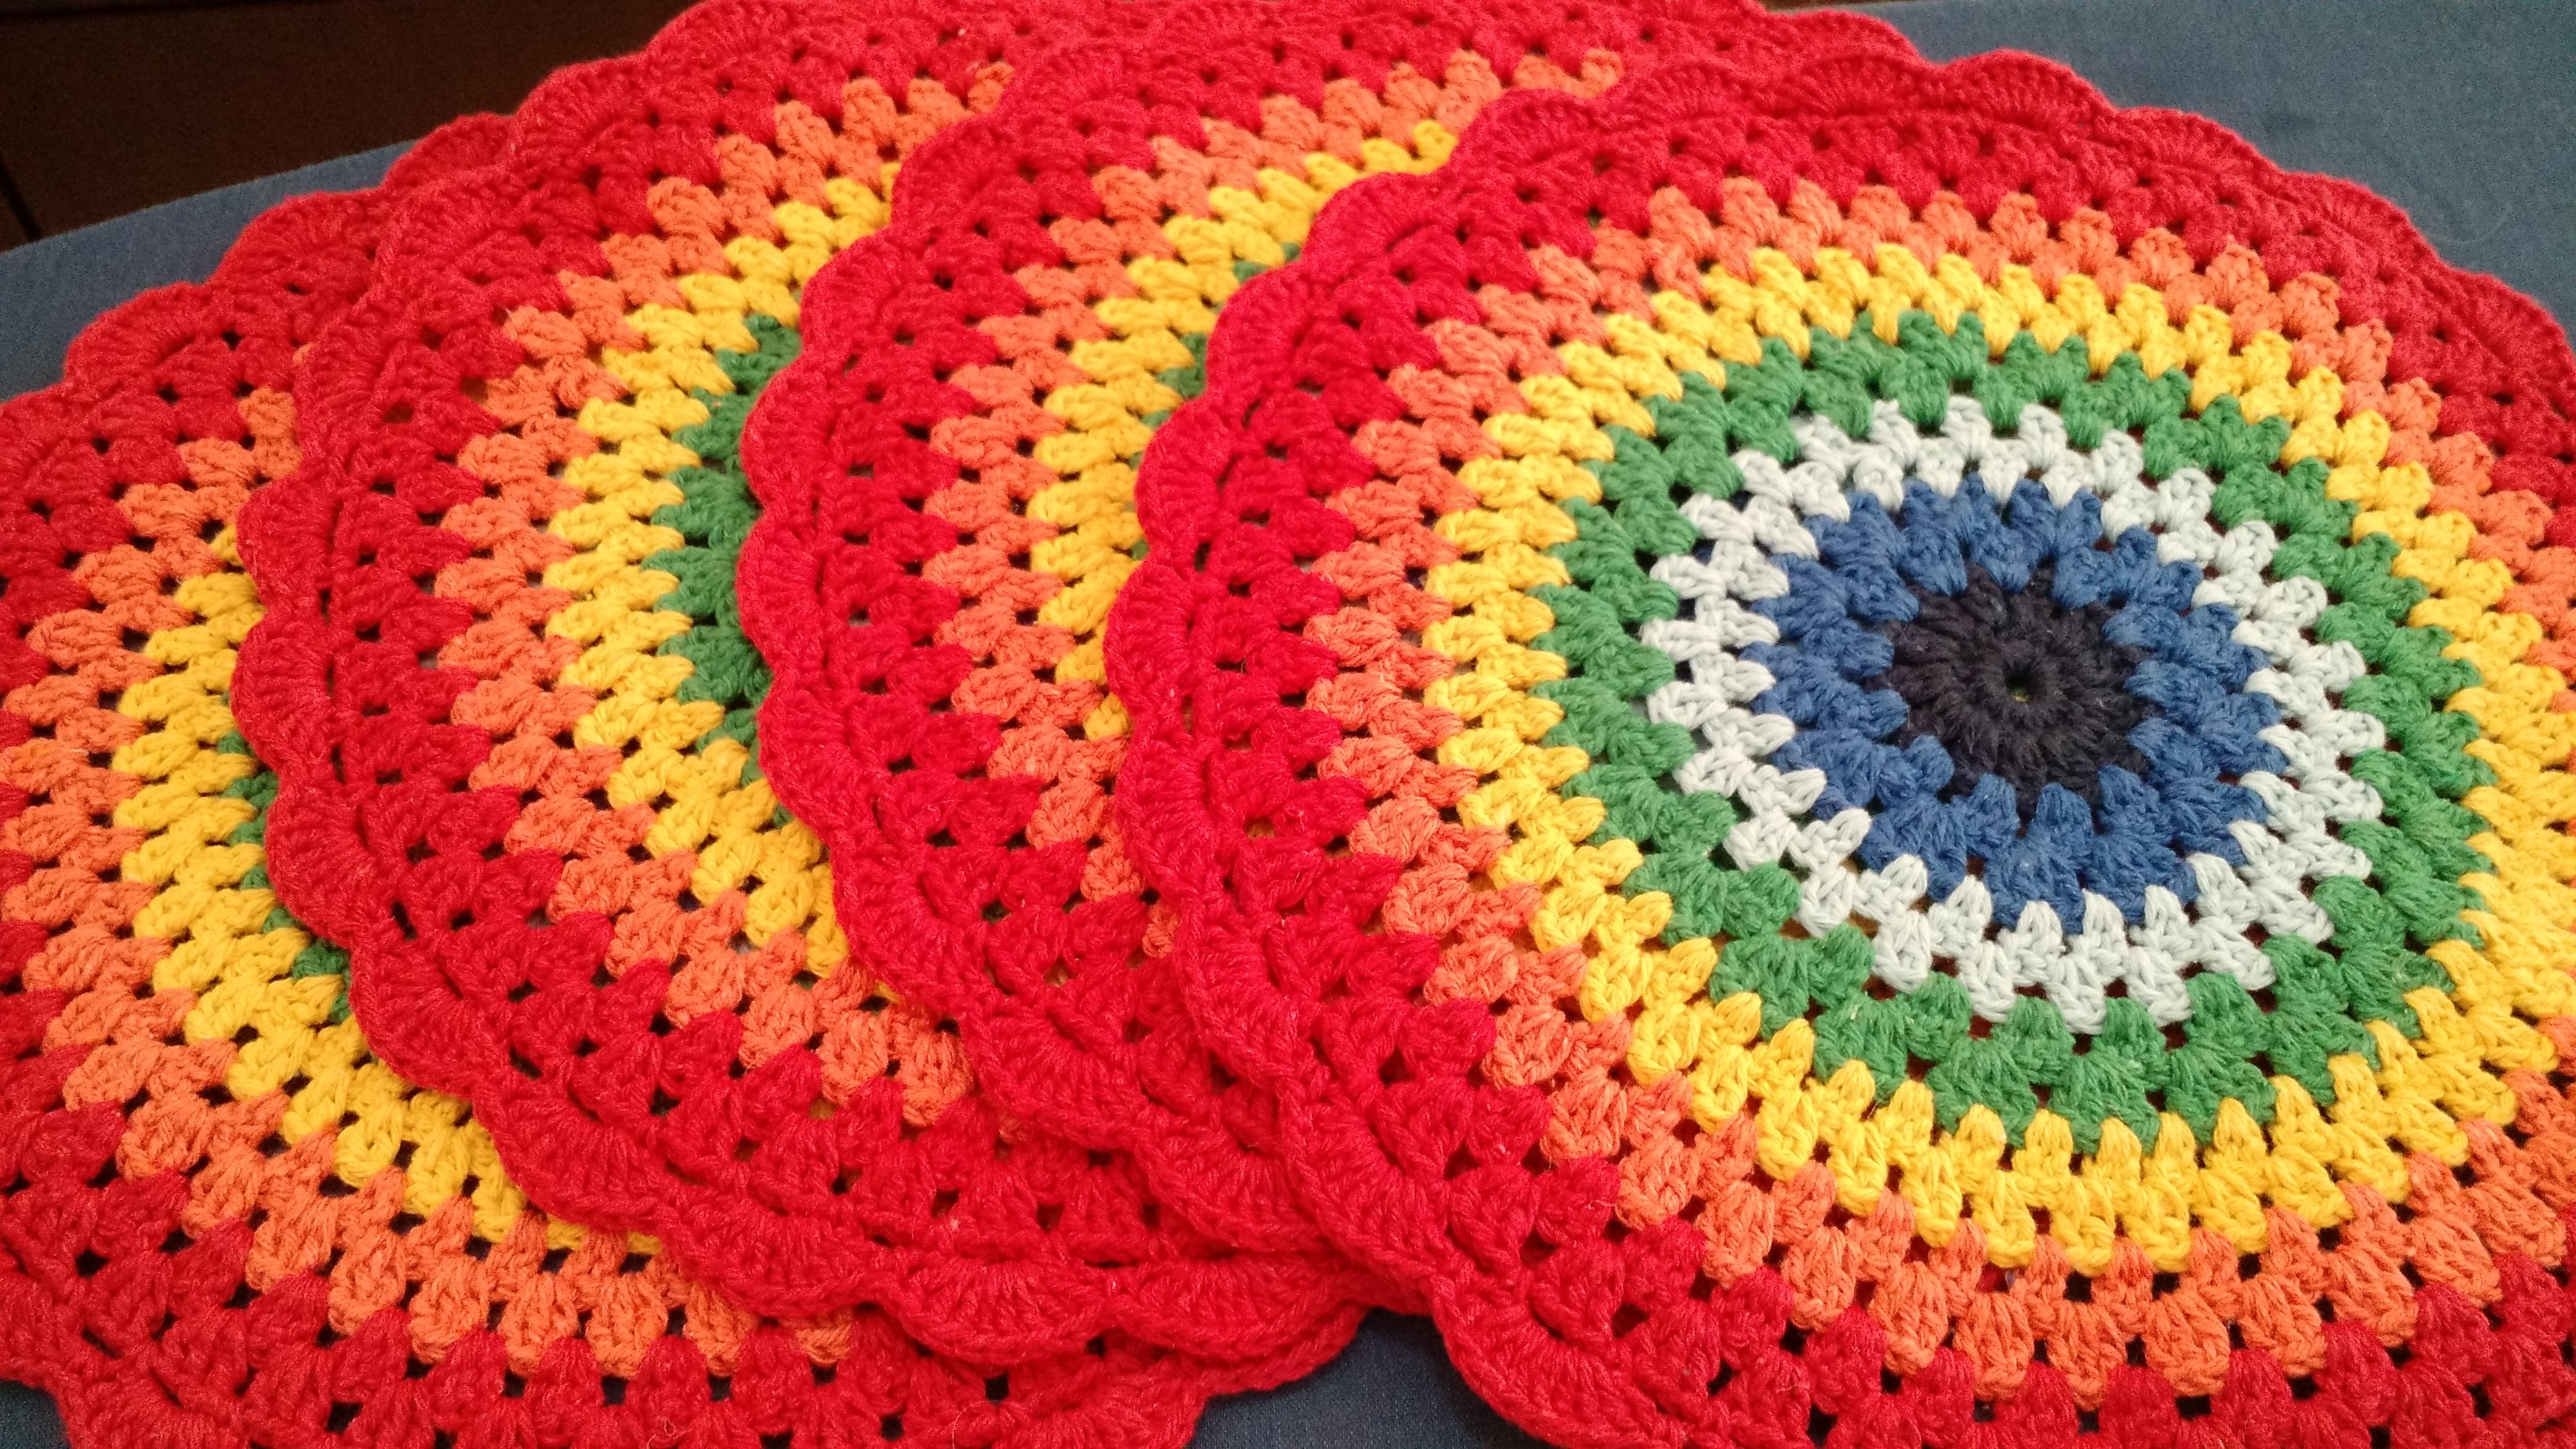 Jogo americano de crochê colorido